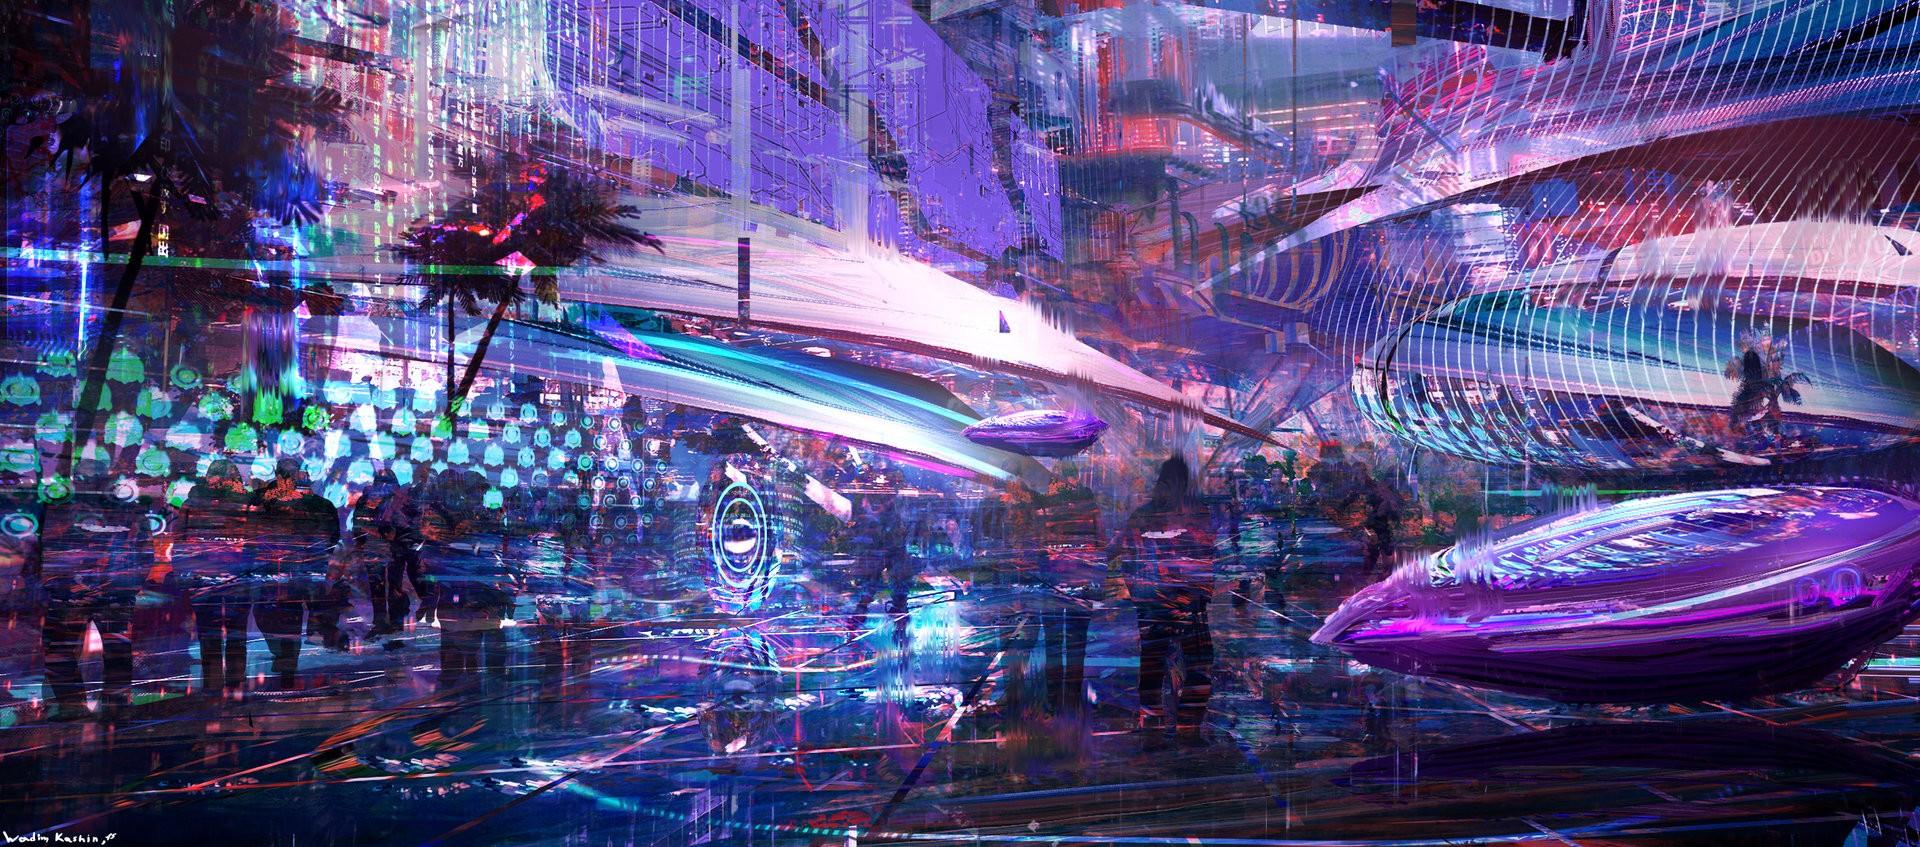 257532-artwork-digital_art-city-futuristic-cyberpunk.jpg